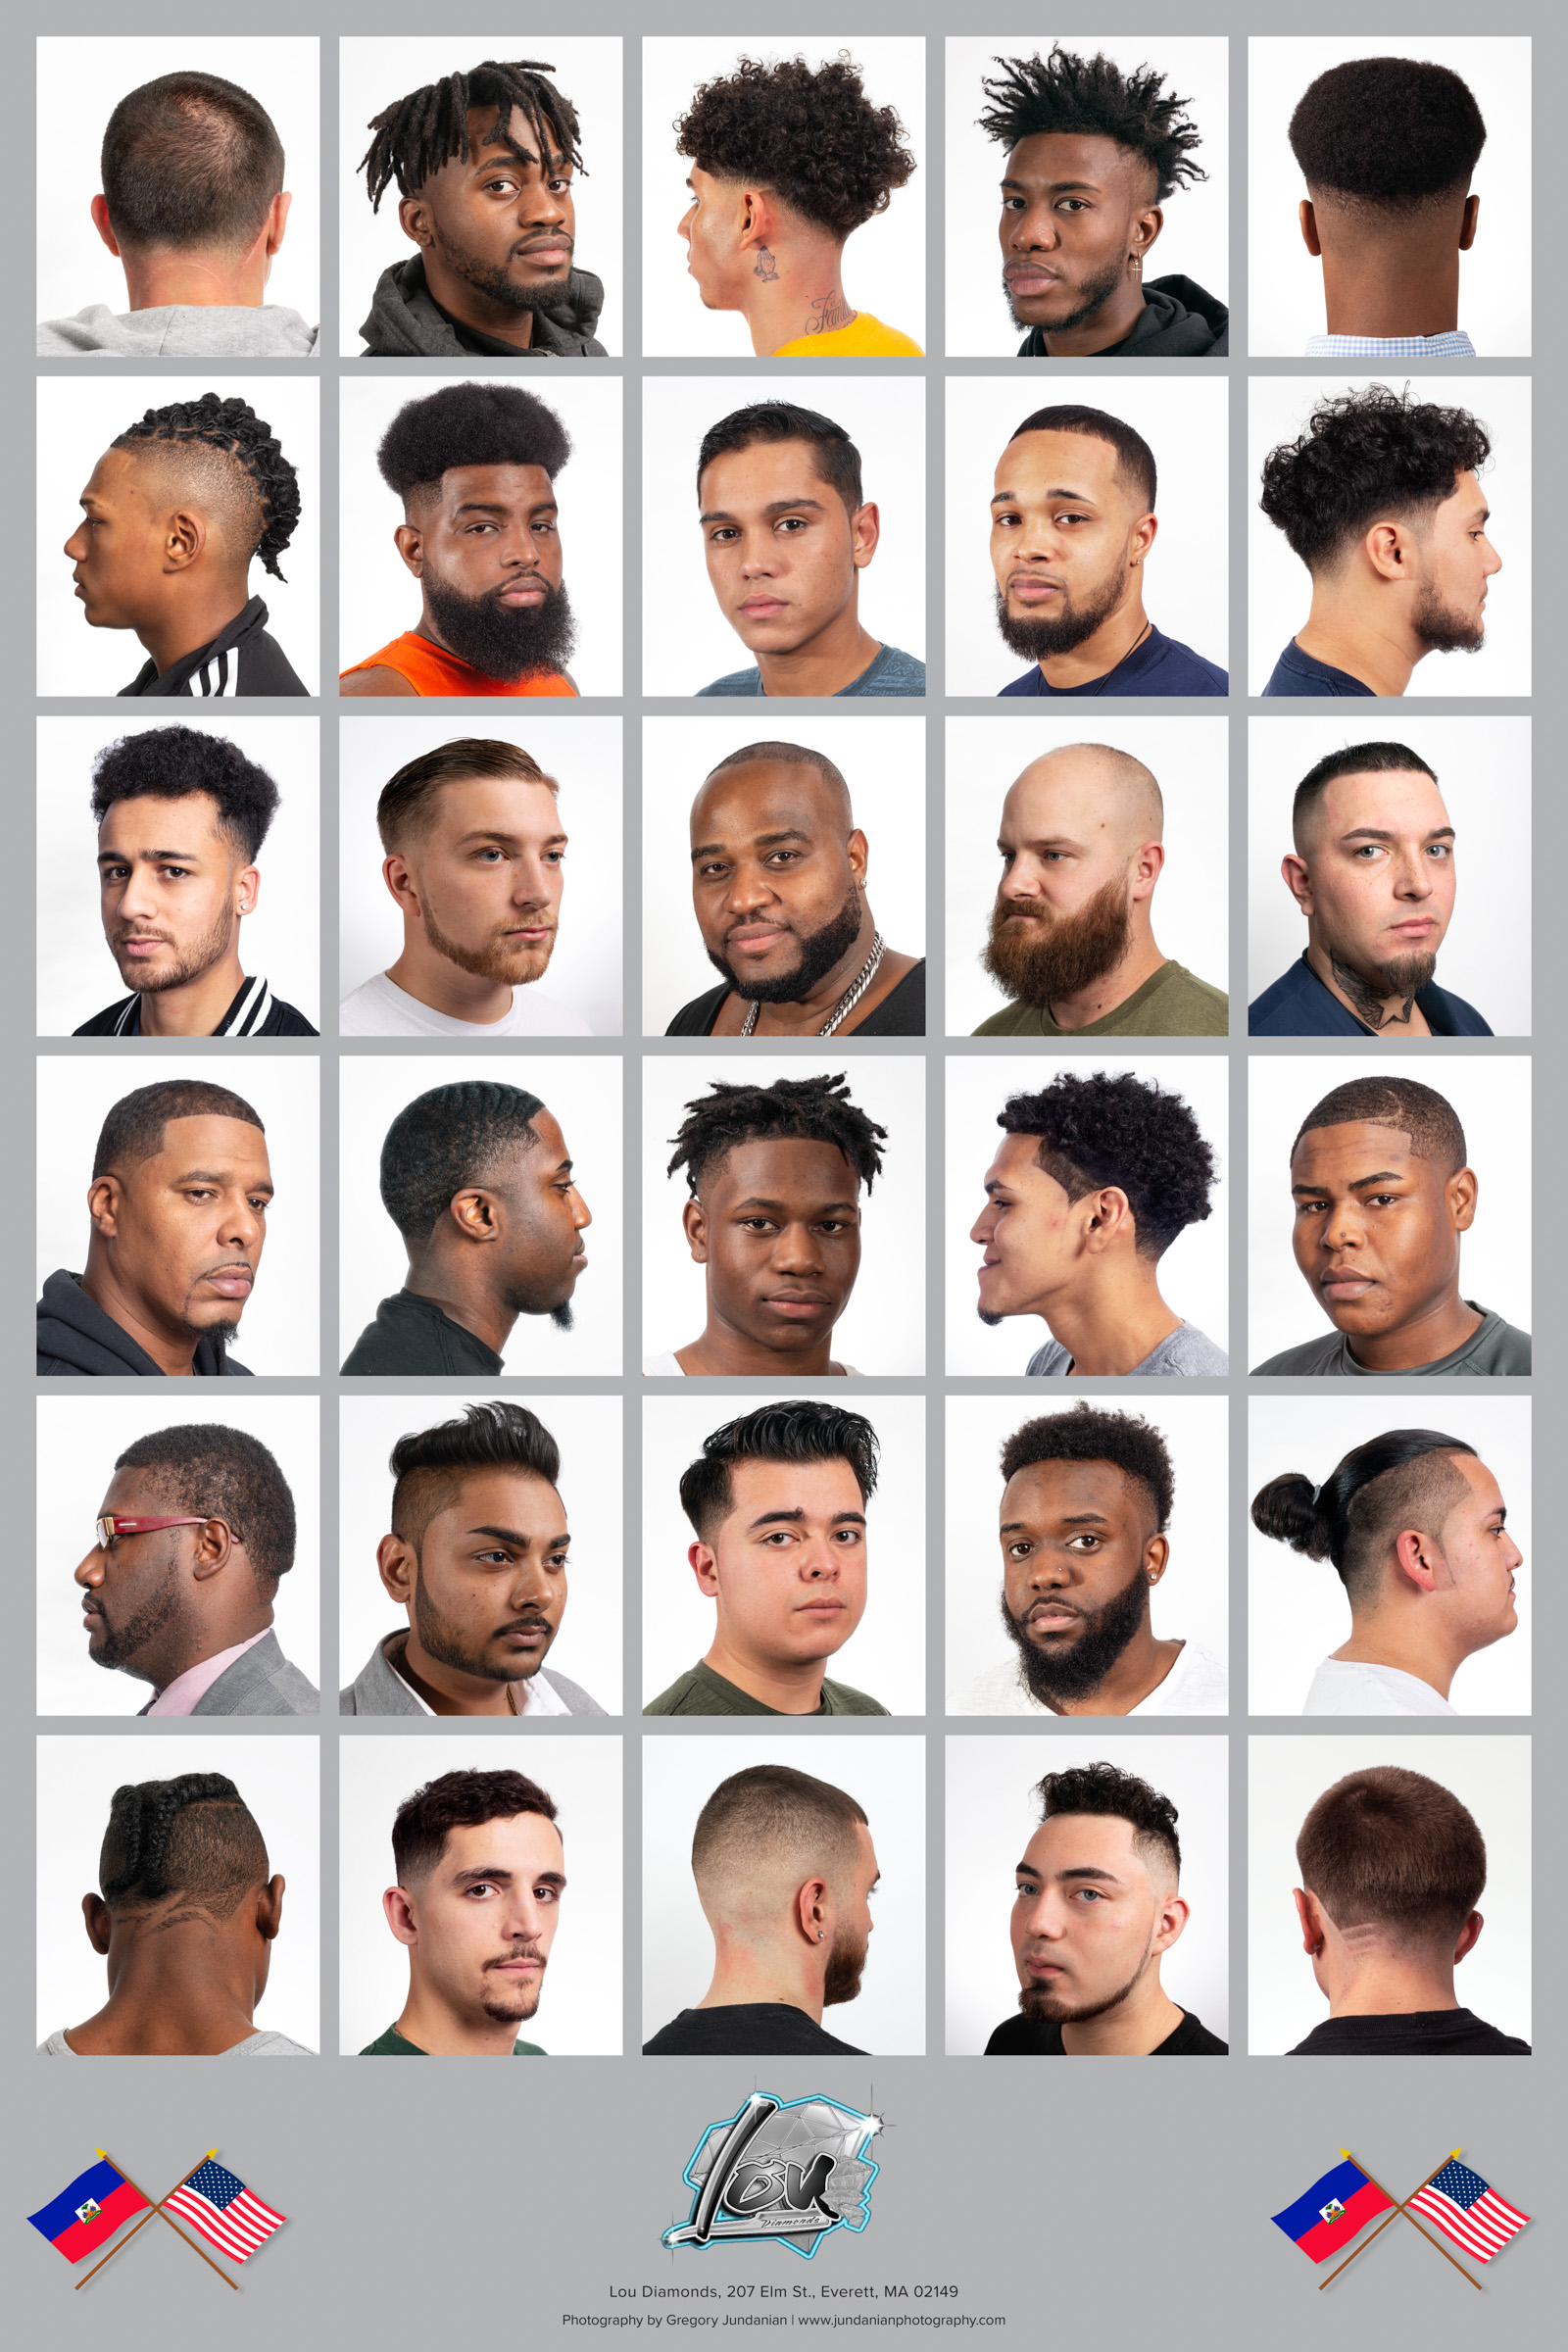 Lou Diamonds' Barbershop, Everett, MA